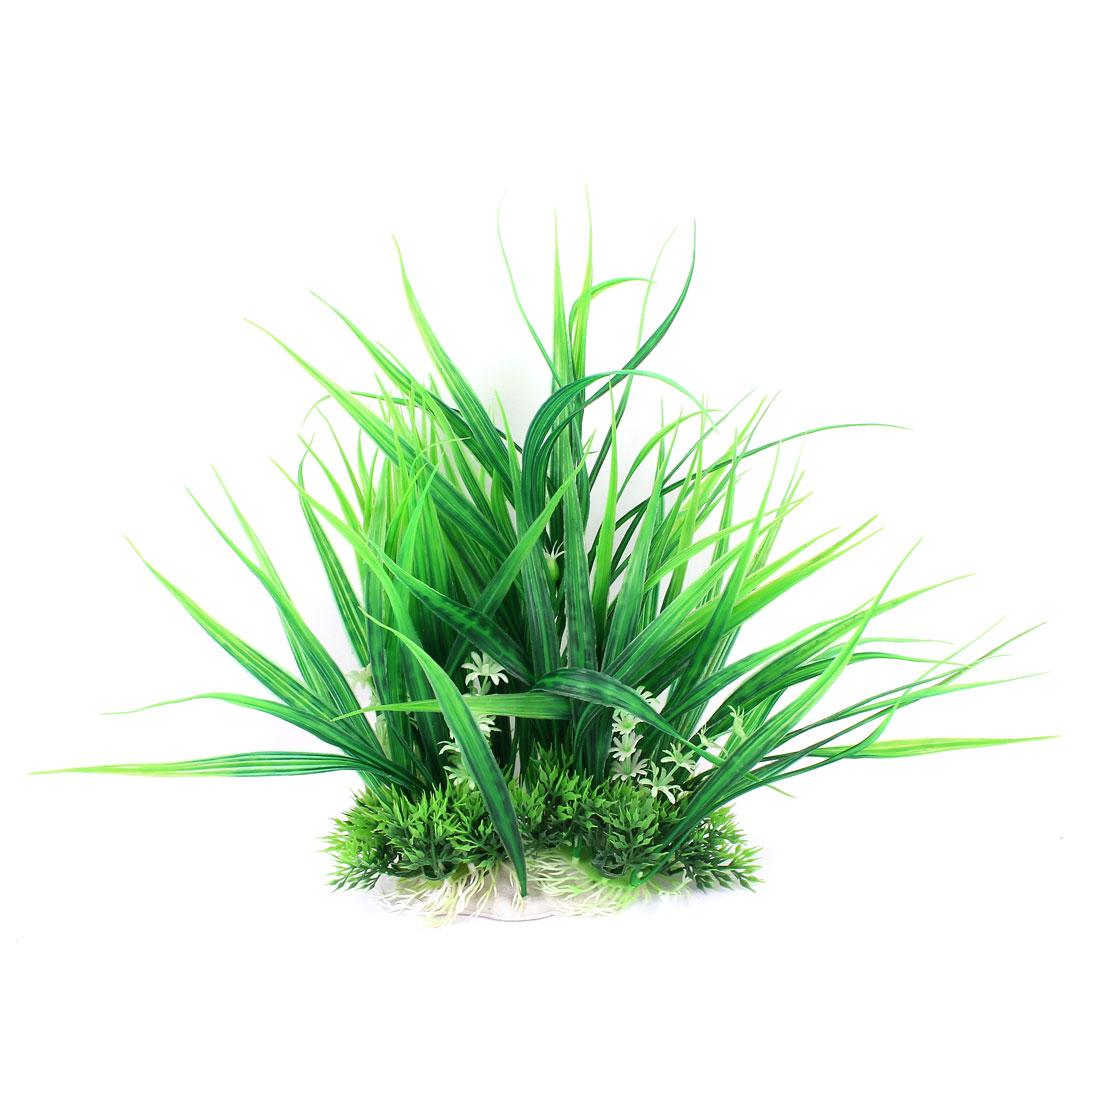 Plastic Artificial Aquarium Fish Tank Green Water Grass Plant Decor 11.8Inch Height